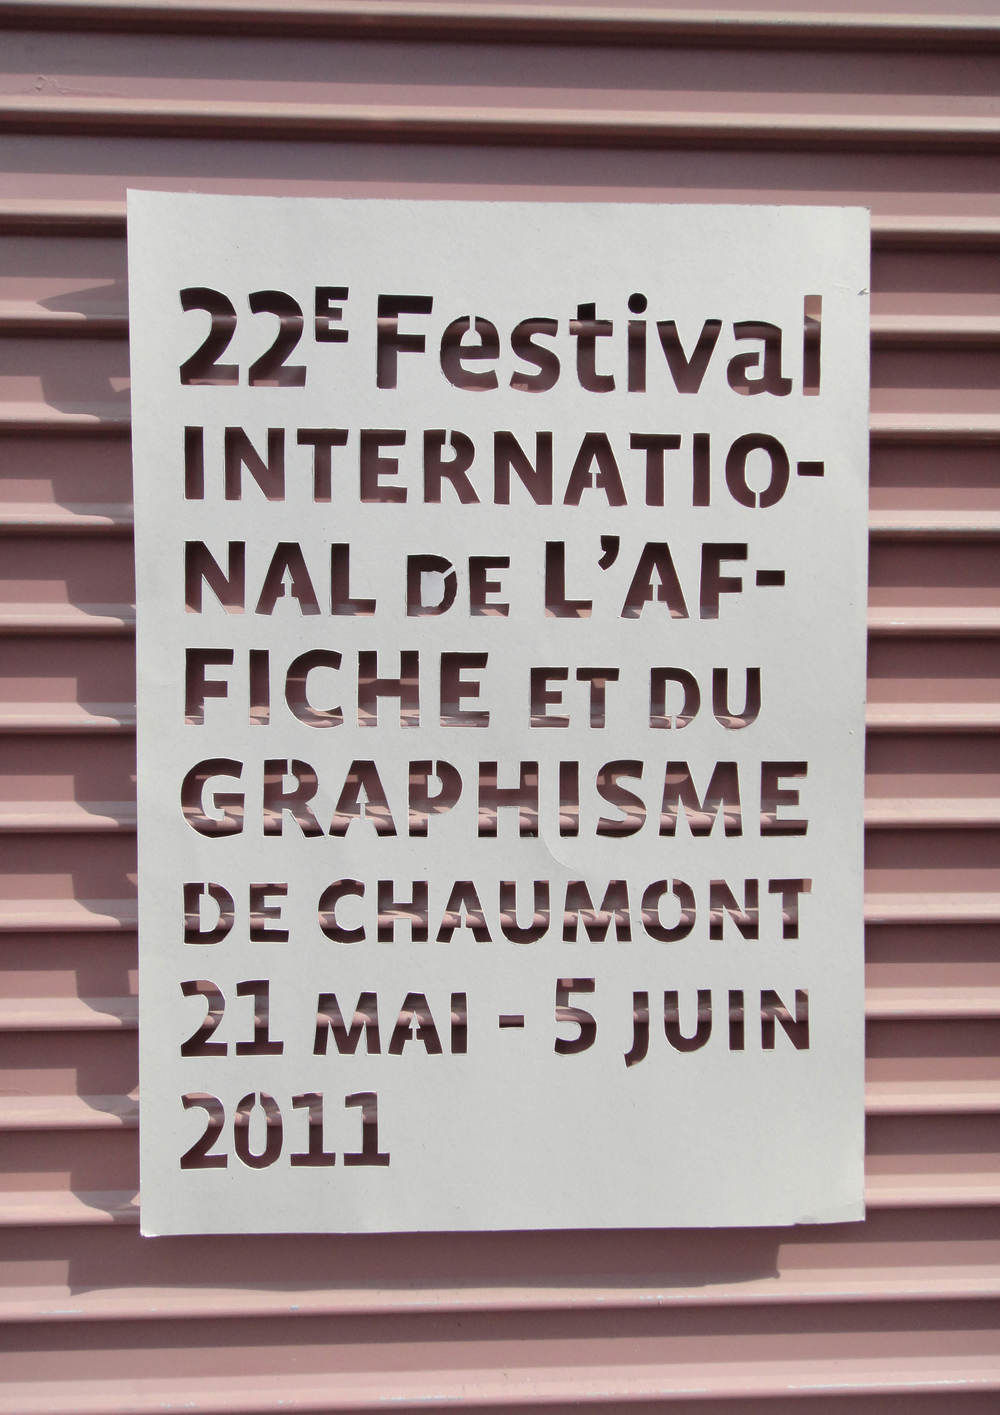 Chaumont_2.jpg